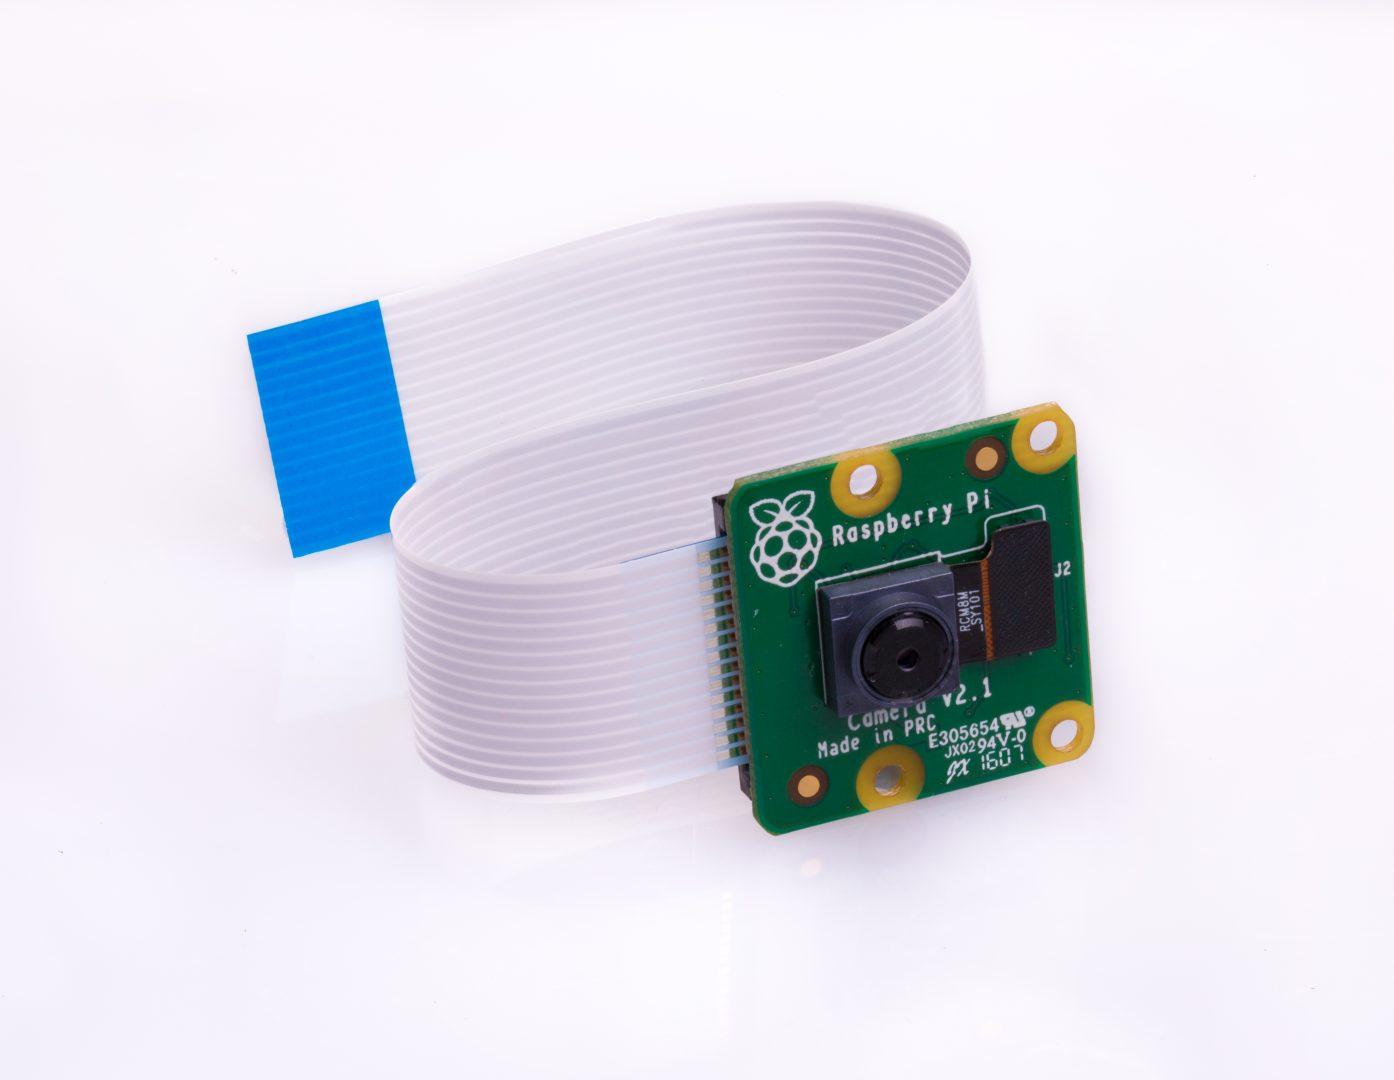 Camera Module V2 - Raspberry Pi